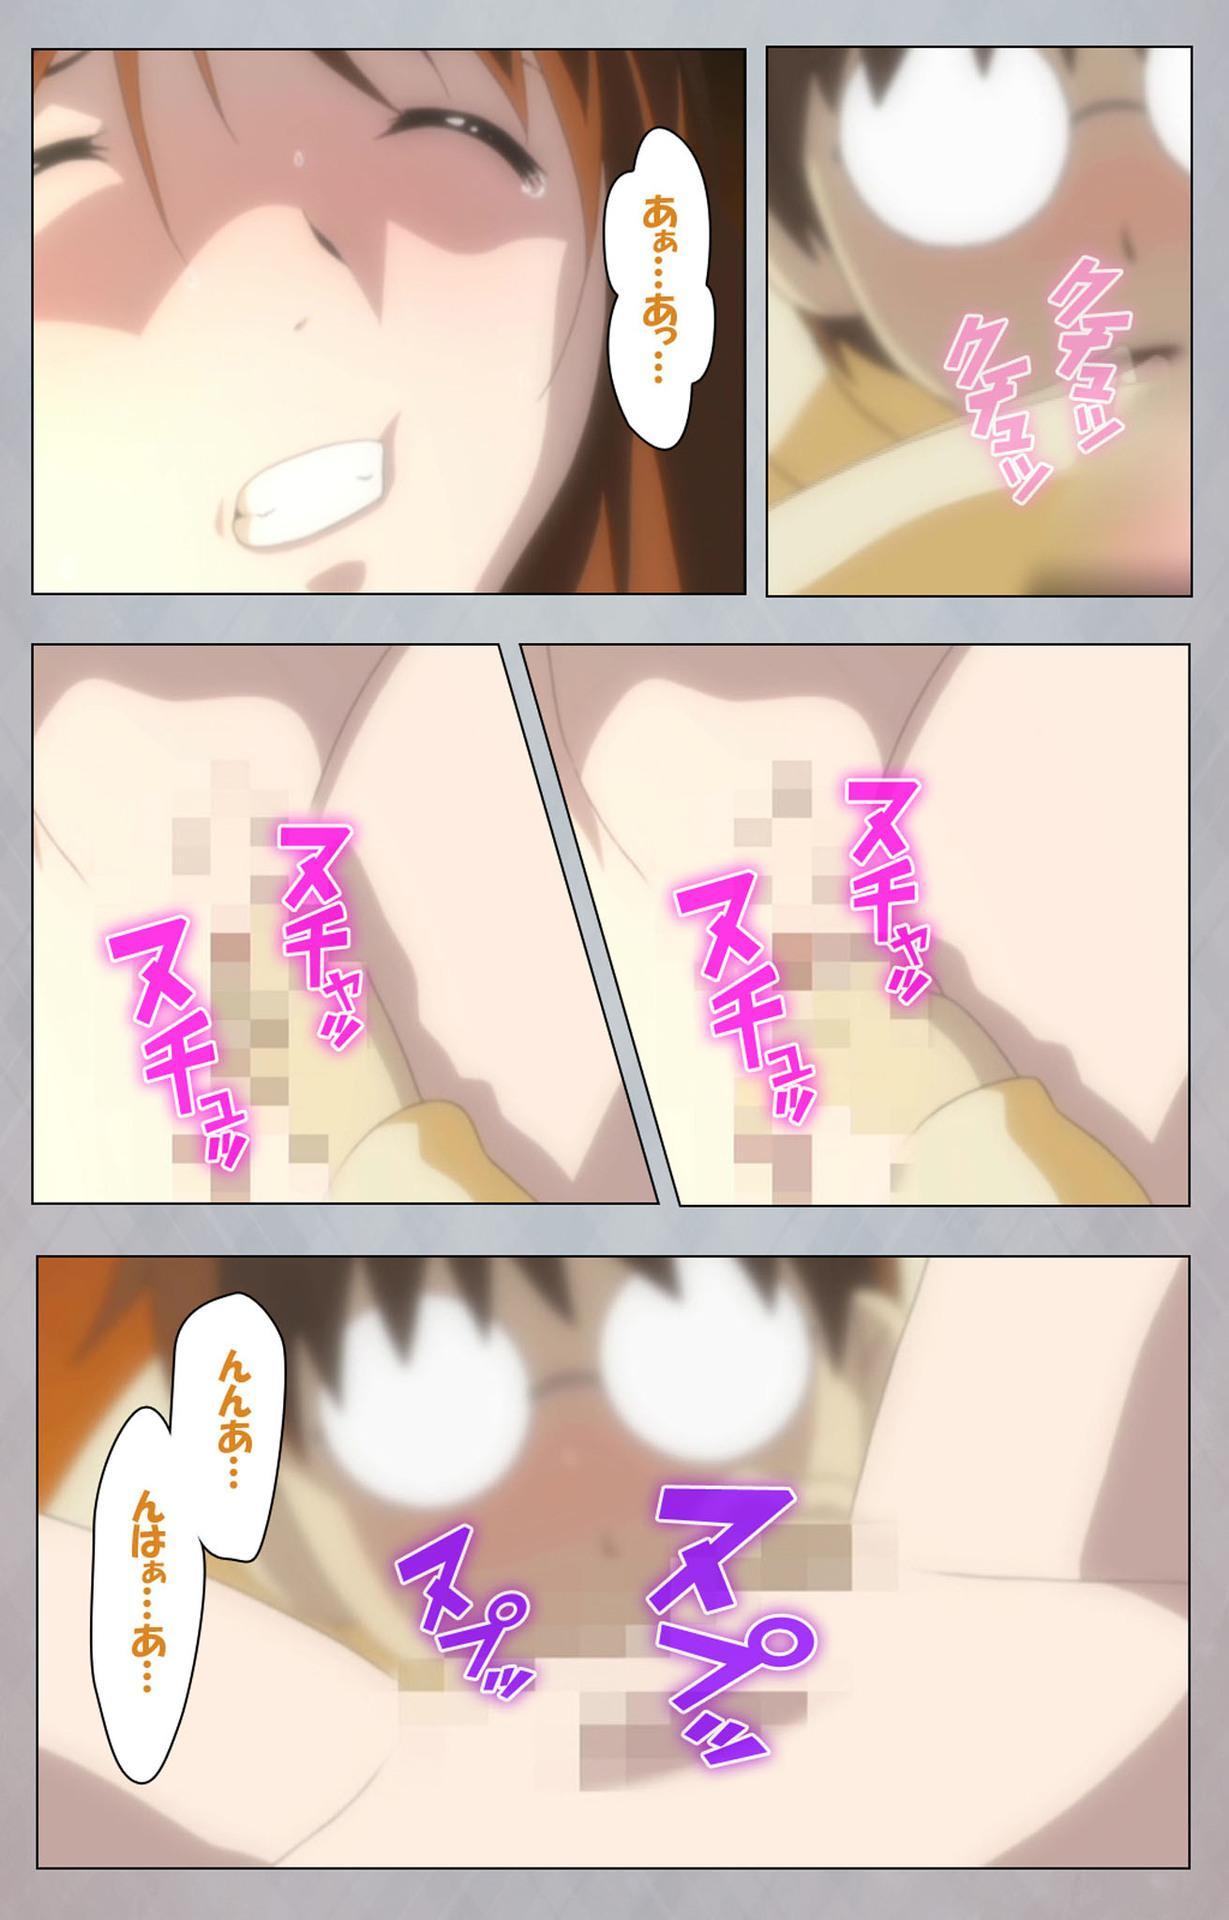 [Digital Works] [Full Color Seijin Ban] Sex Android ~Risou no Onna de Nuite yaru~ Kanzenban 84